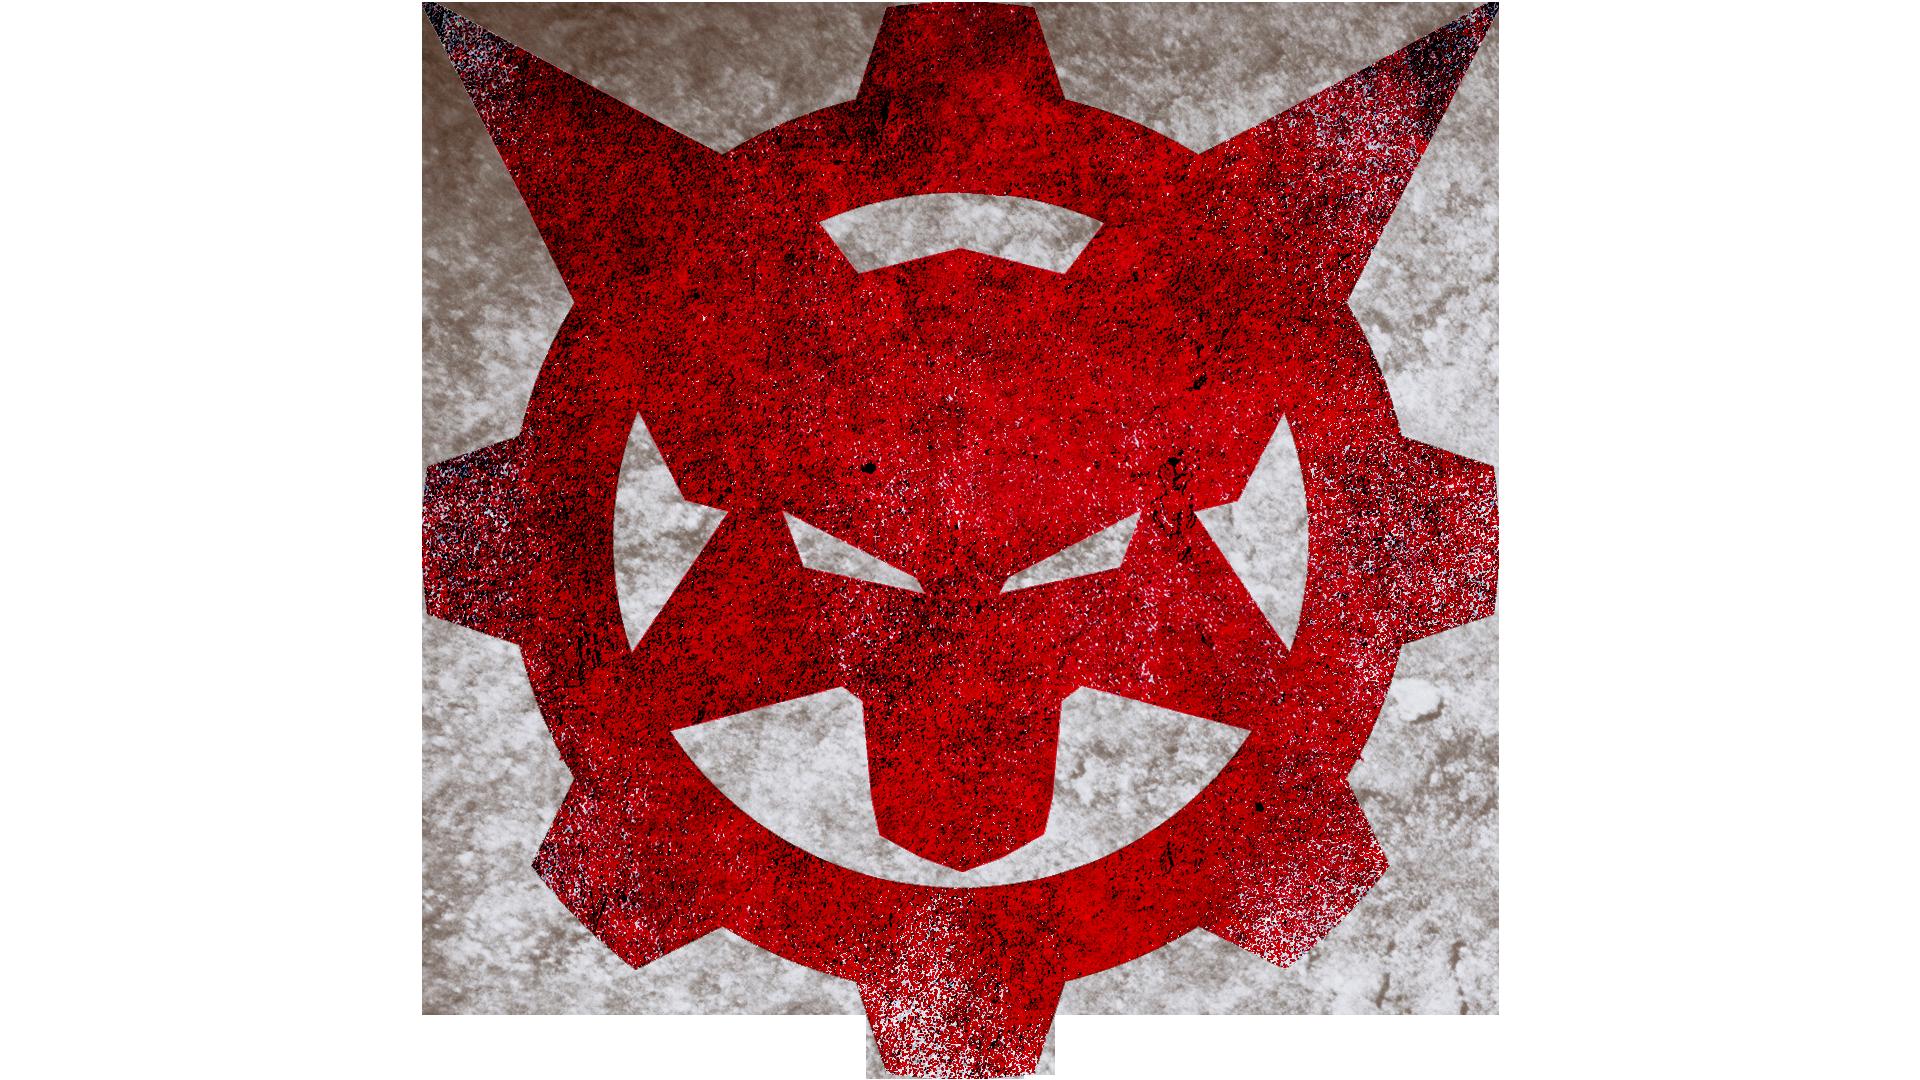 Gears Of War Fox Cog For Stream The Fox Feed